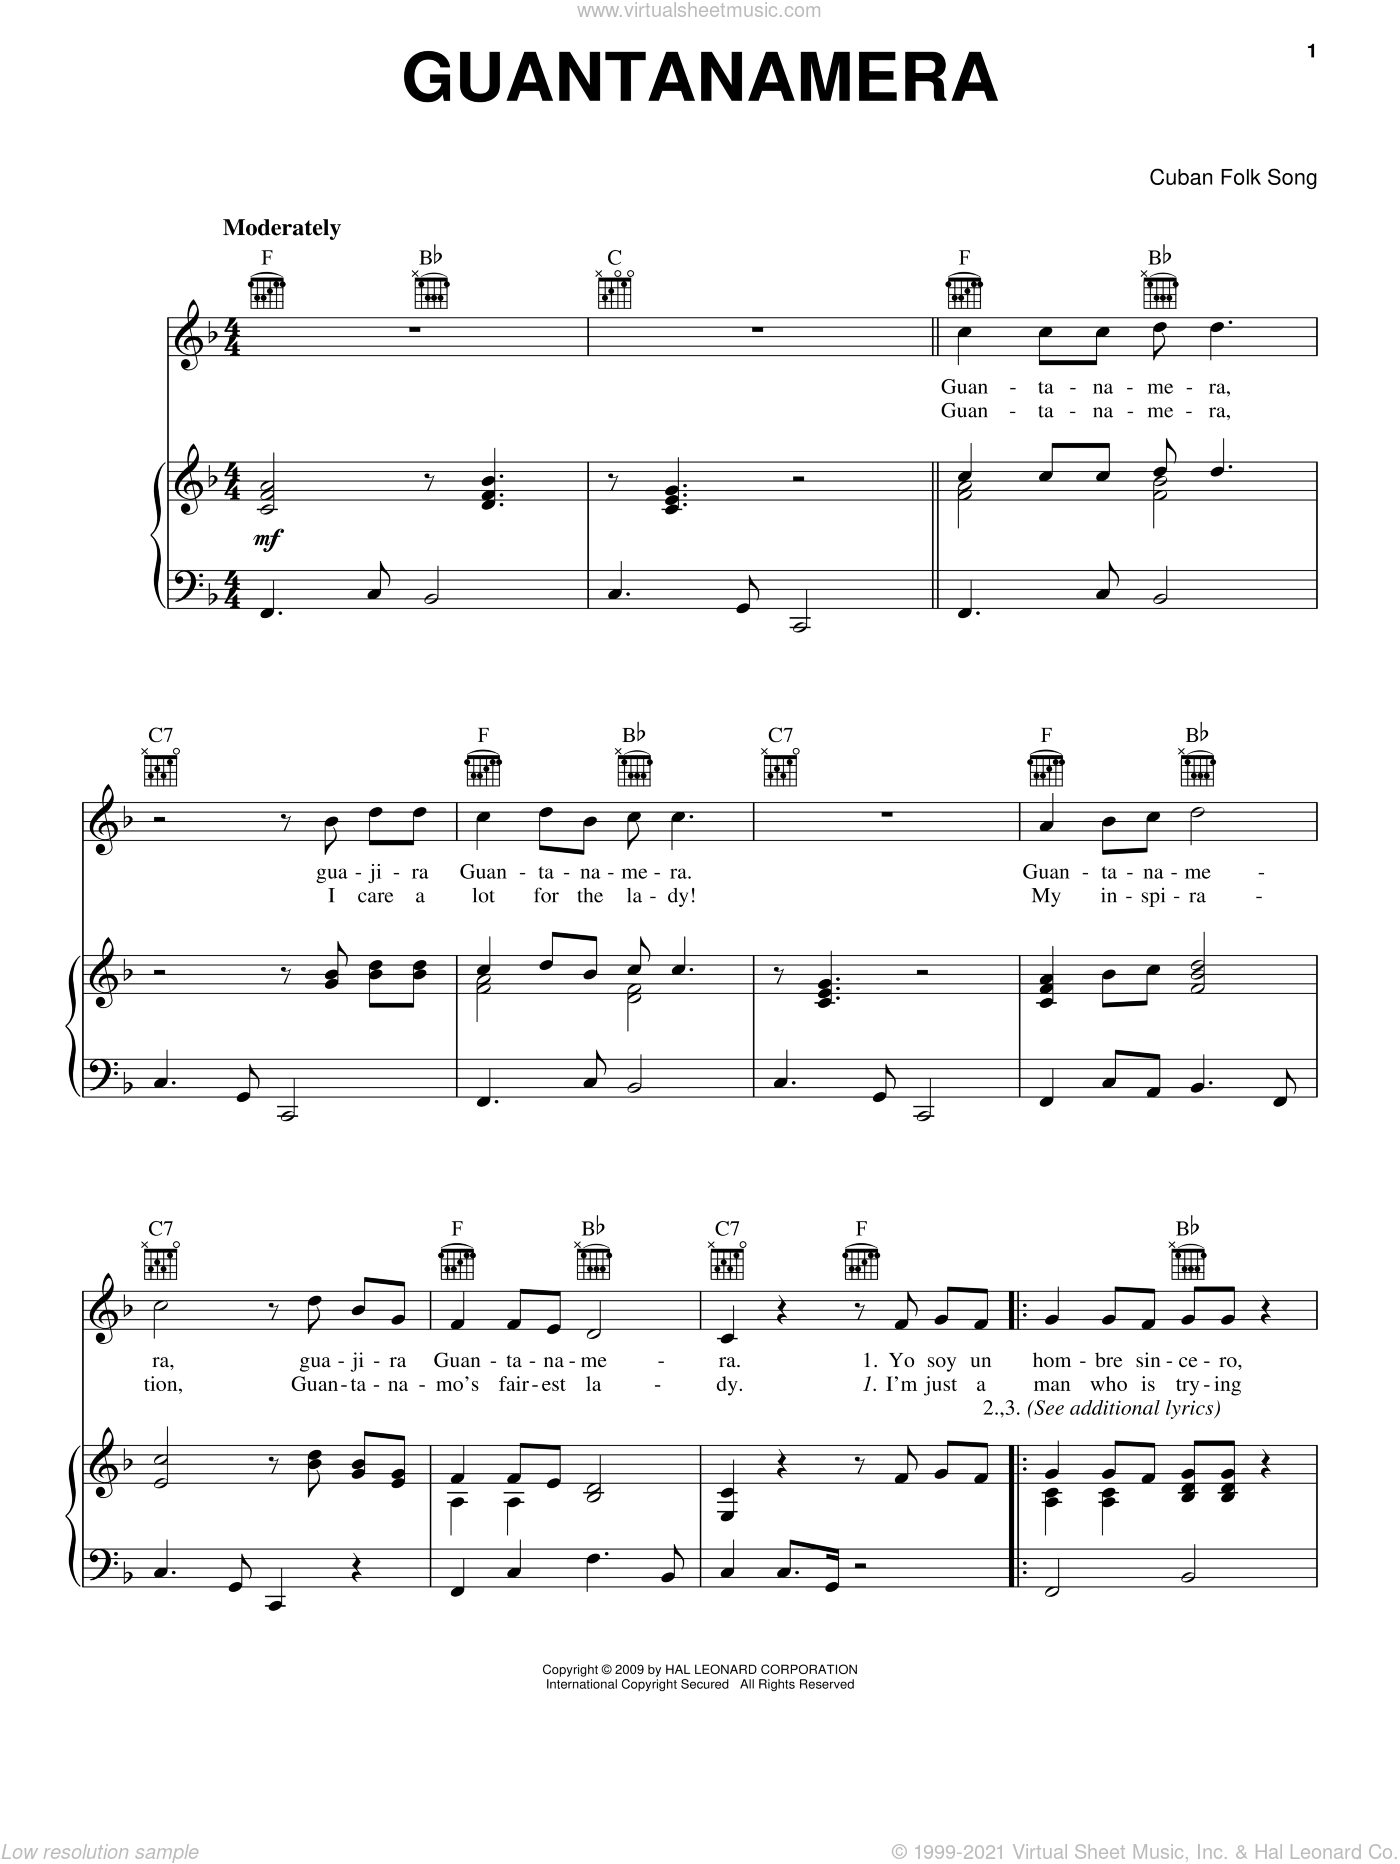 Guantanamera sheet music for voice, piano or guitar, intermediate skill level